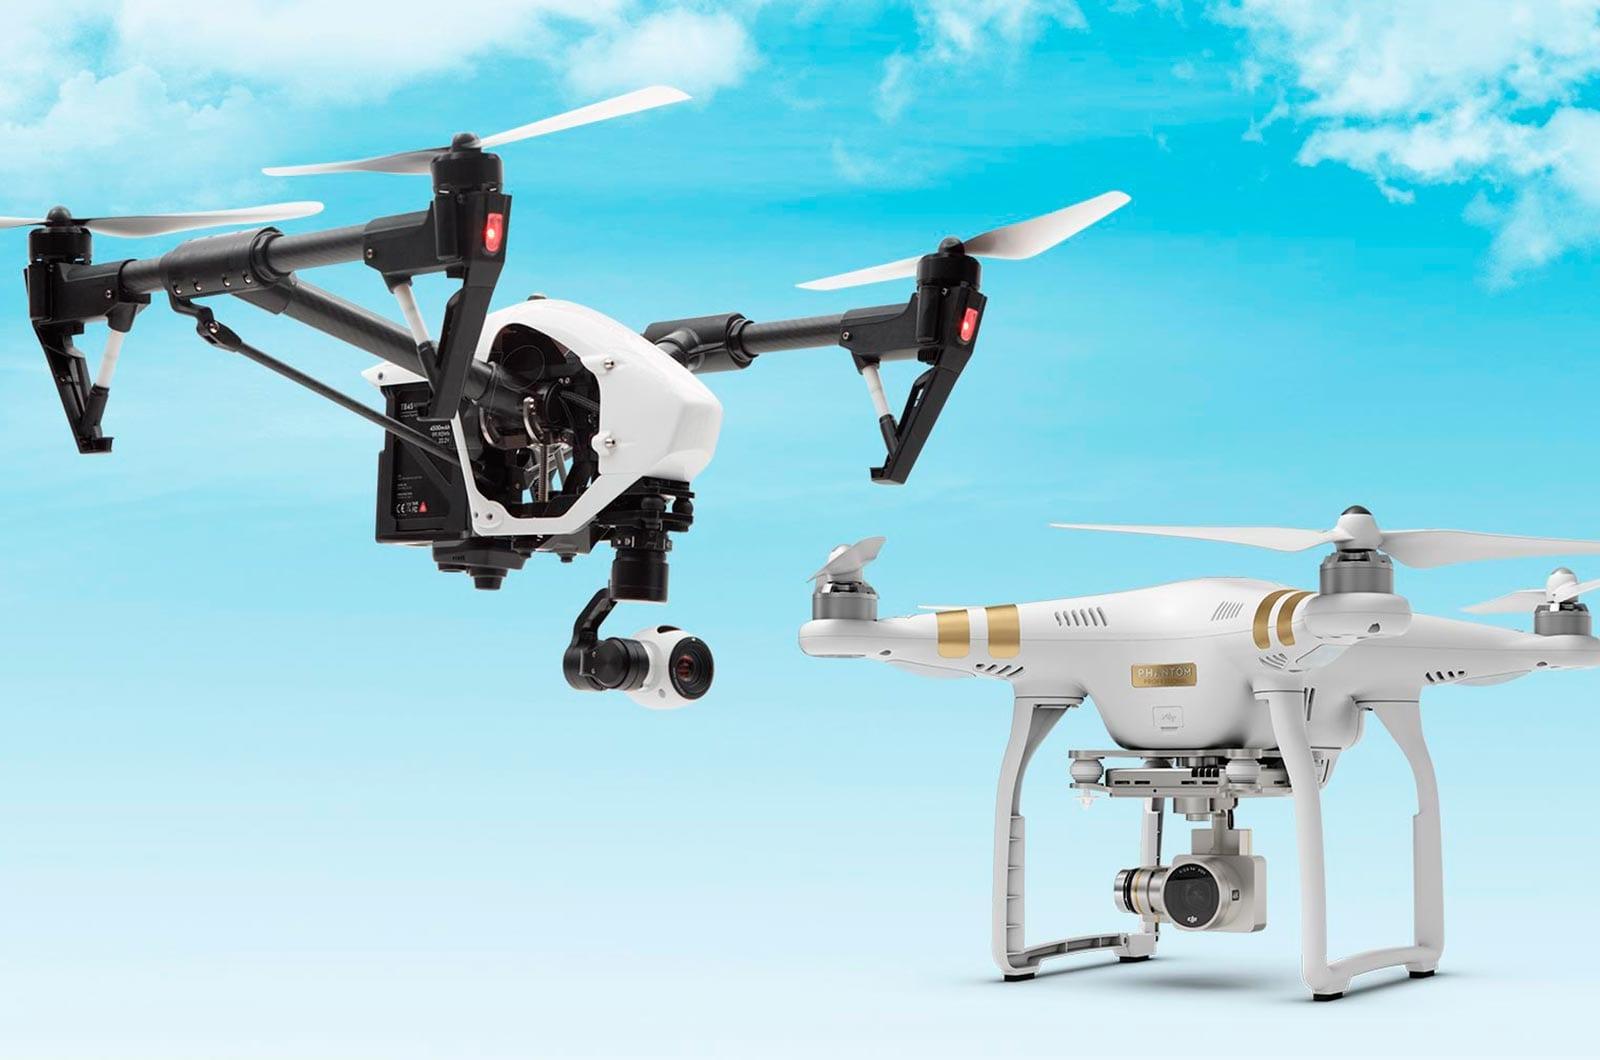 DJI's Best Drones: Inspire 1 VS Phantom 3 | DJI | DJI Inspire 1 | DJI Phantom 3 | DJI Inspire 1 Drone | Indoor Positioning Technology | Aerial Drone Photography Services | Drone Photography | Aerial Photography Services